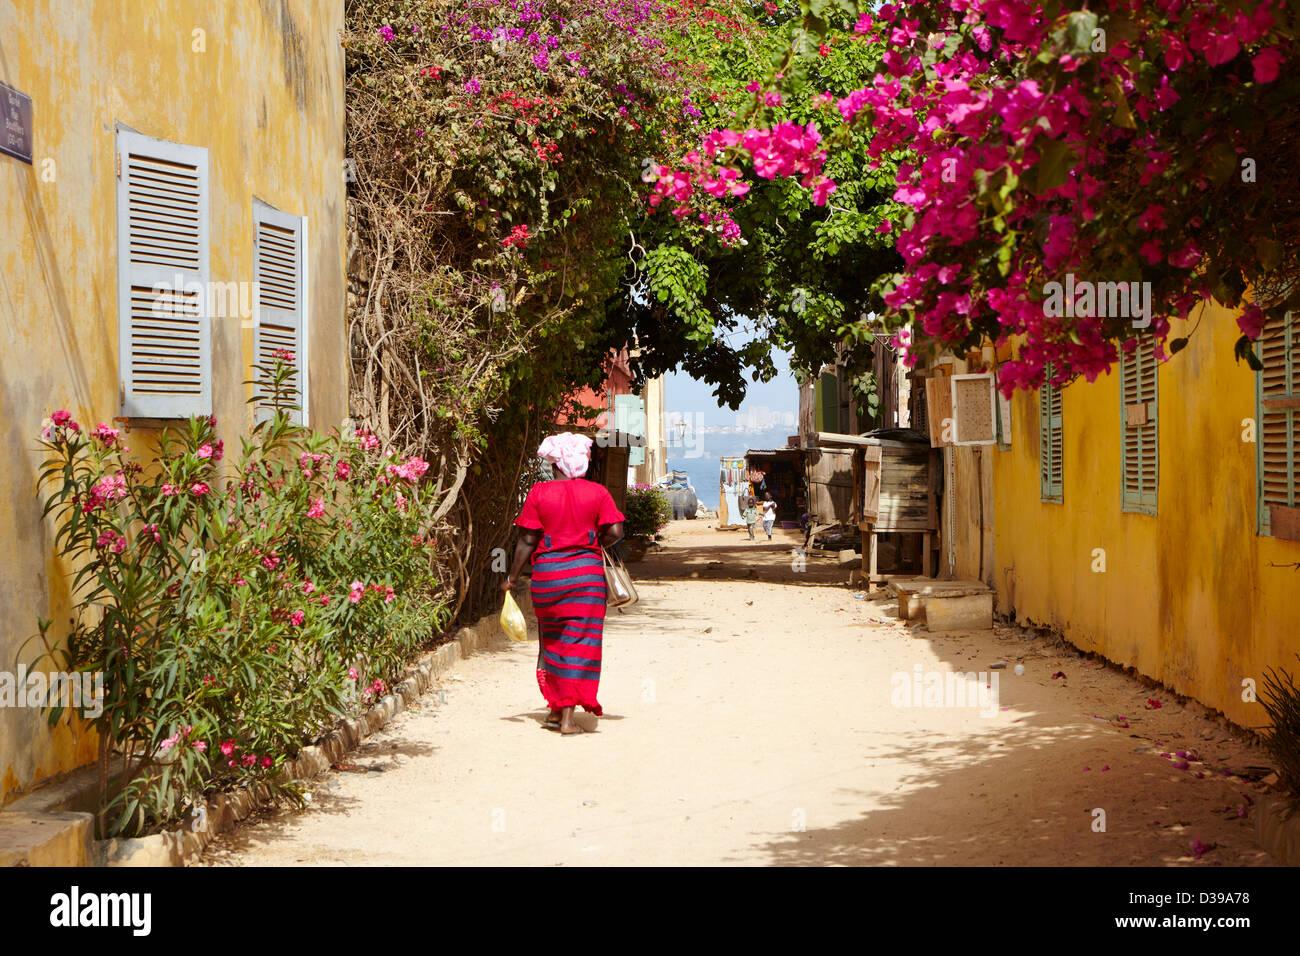 Rue Bouffles, Ile de Goree, Senegal Africa Immagini Stock